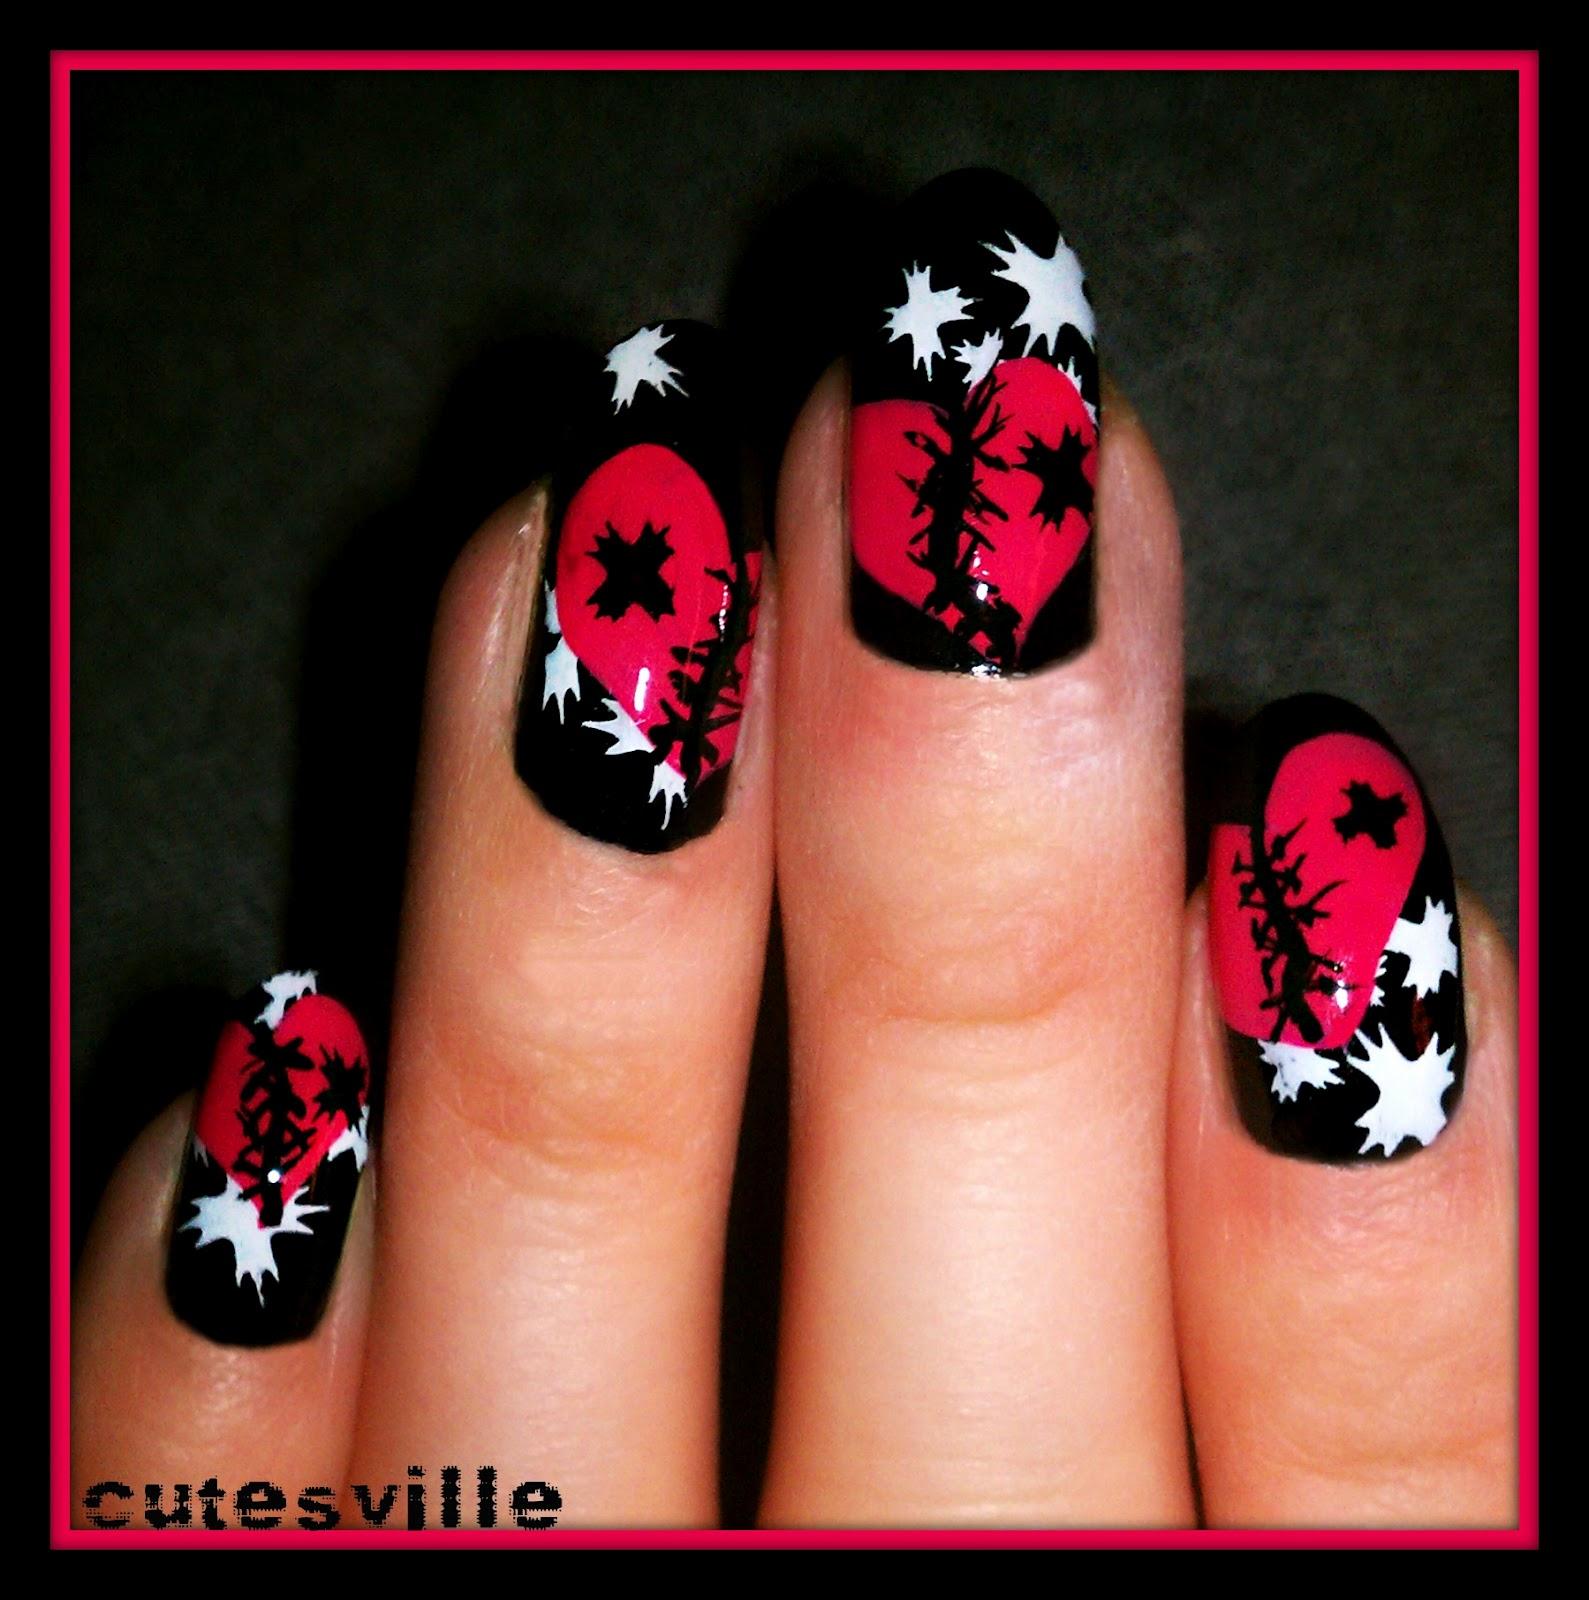 cutesville: a very emo valentine